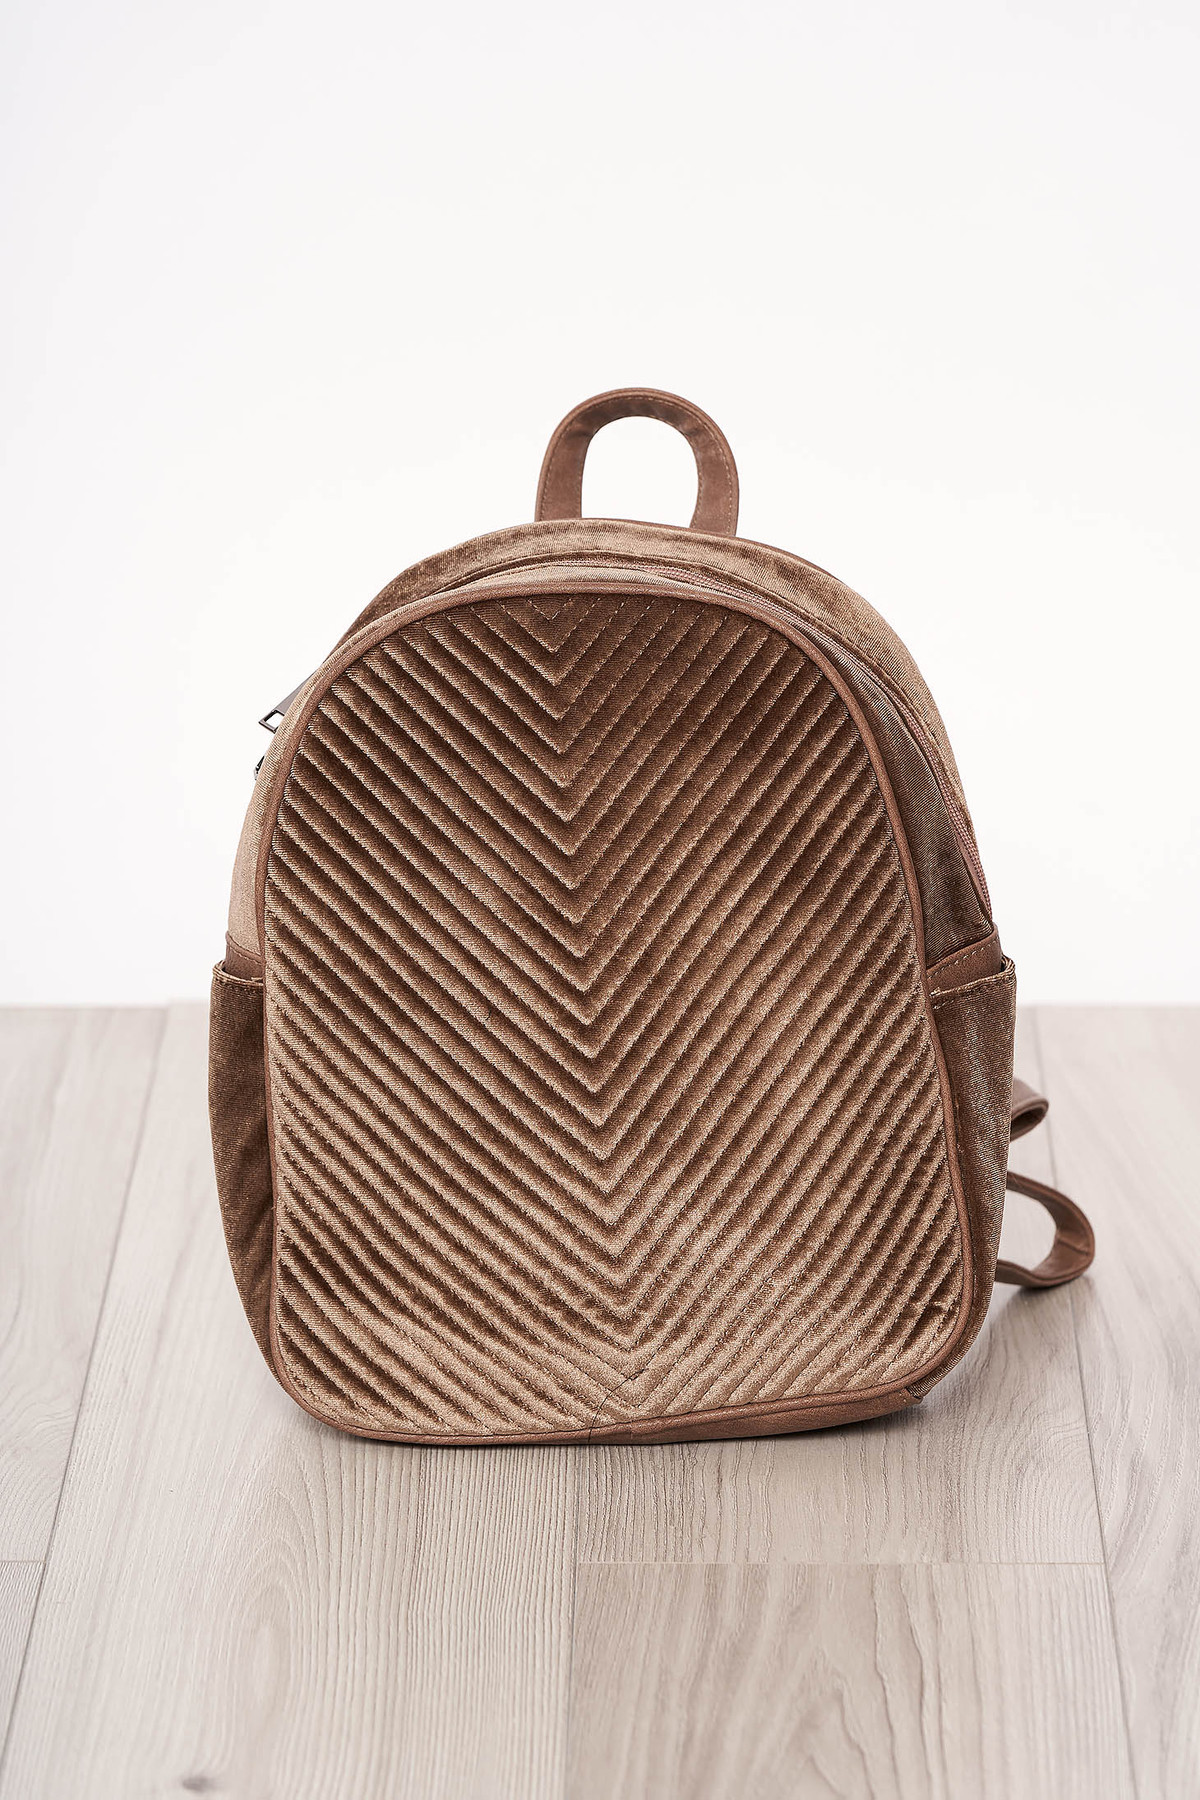 Rucsac SunShine maro-inchis din catifea accesorizat cu fermoar cu maner lung reglabil cu manere scurte